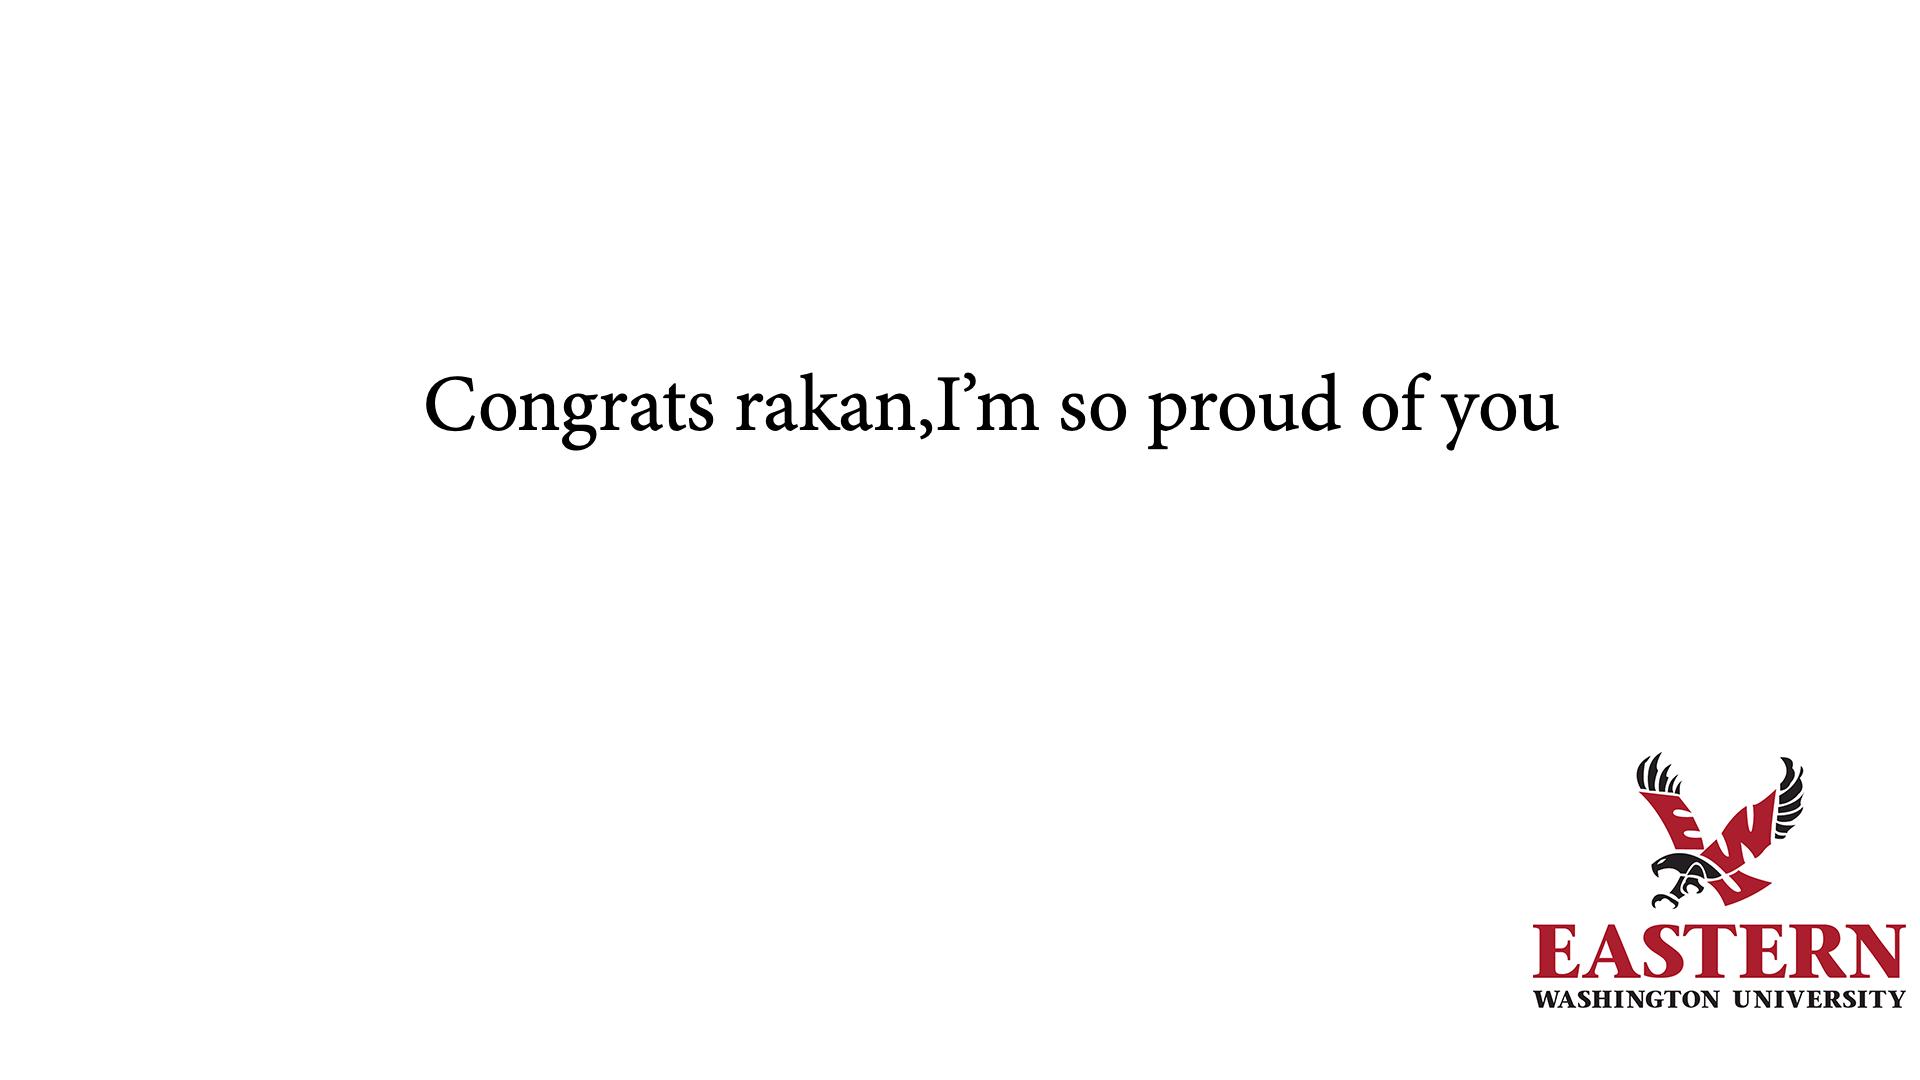 tbi_rakan-mohammed-a-alfayadh_3913.png